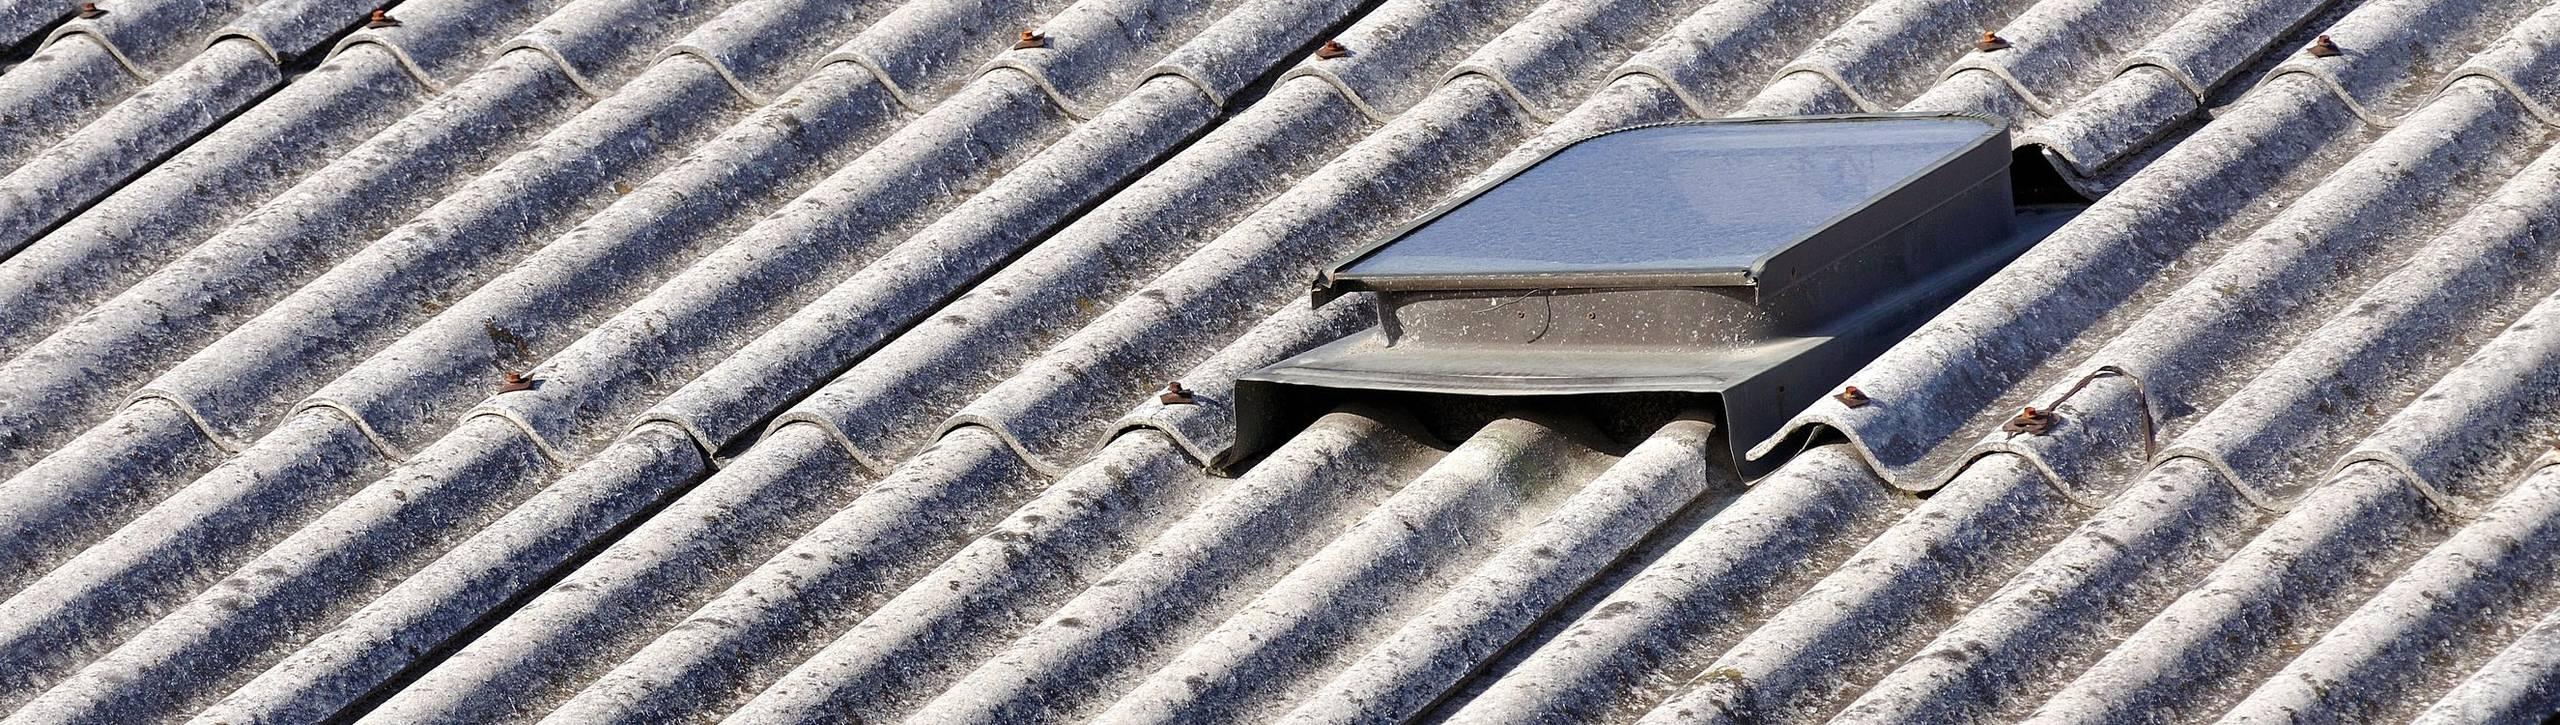 Asbestarbeiten – Toni Ungelert Bauunternehmen